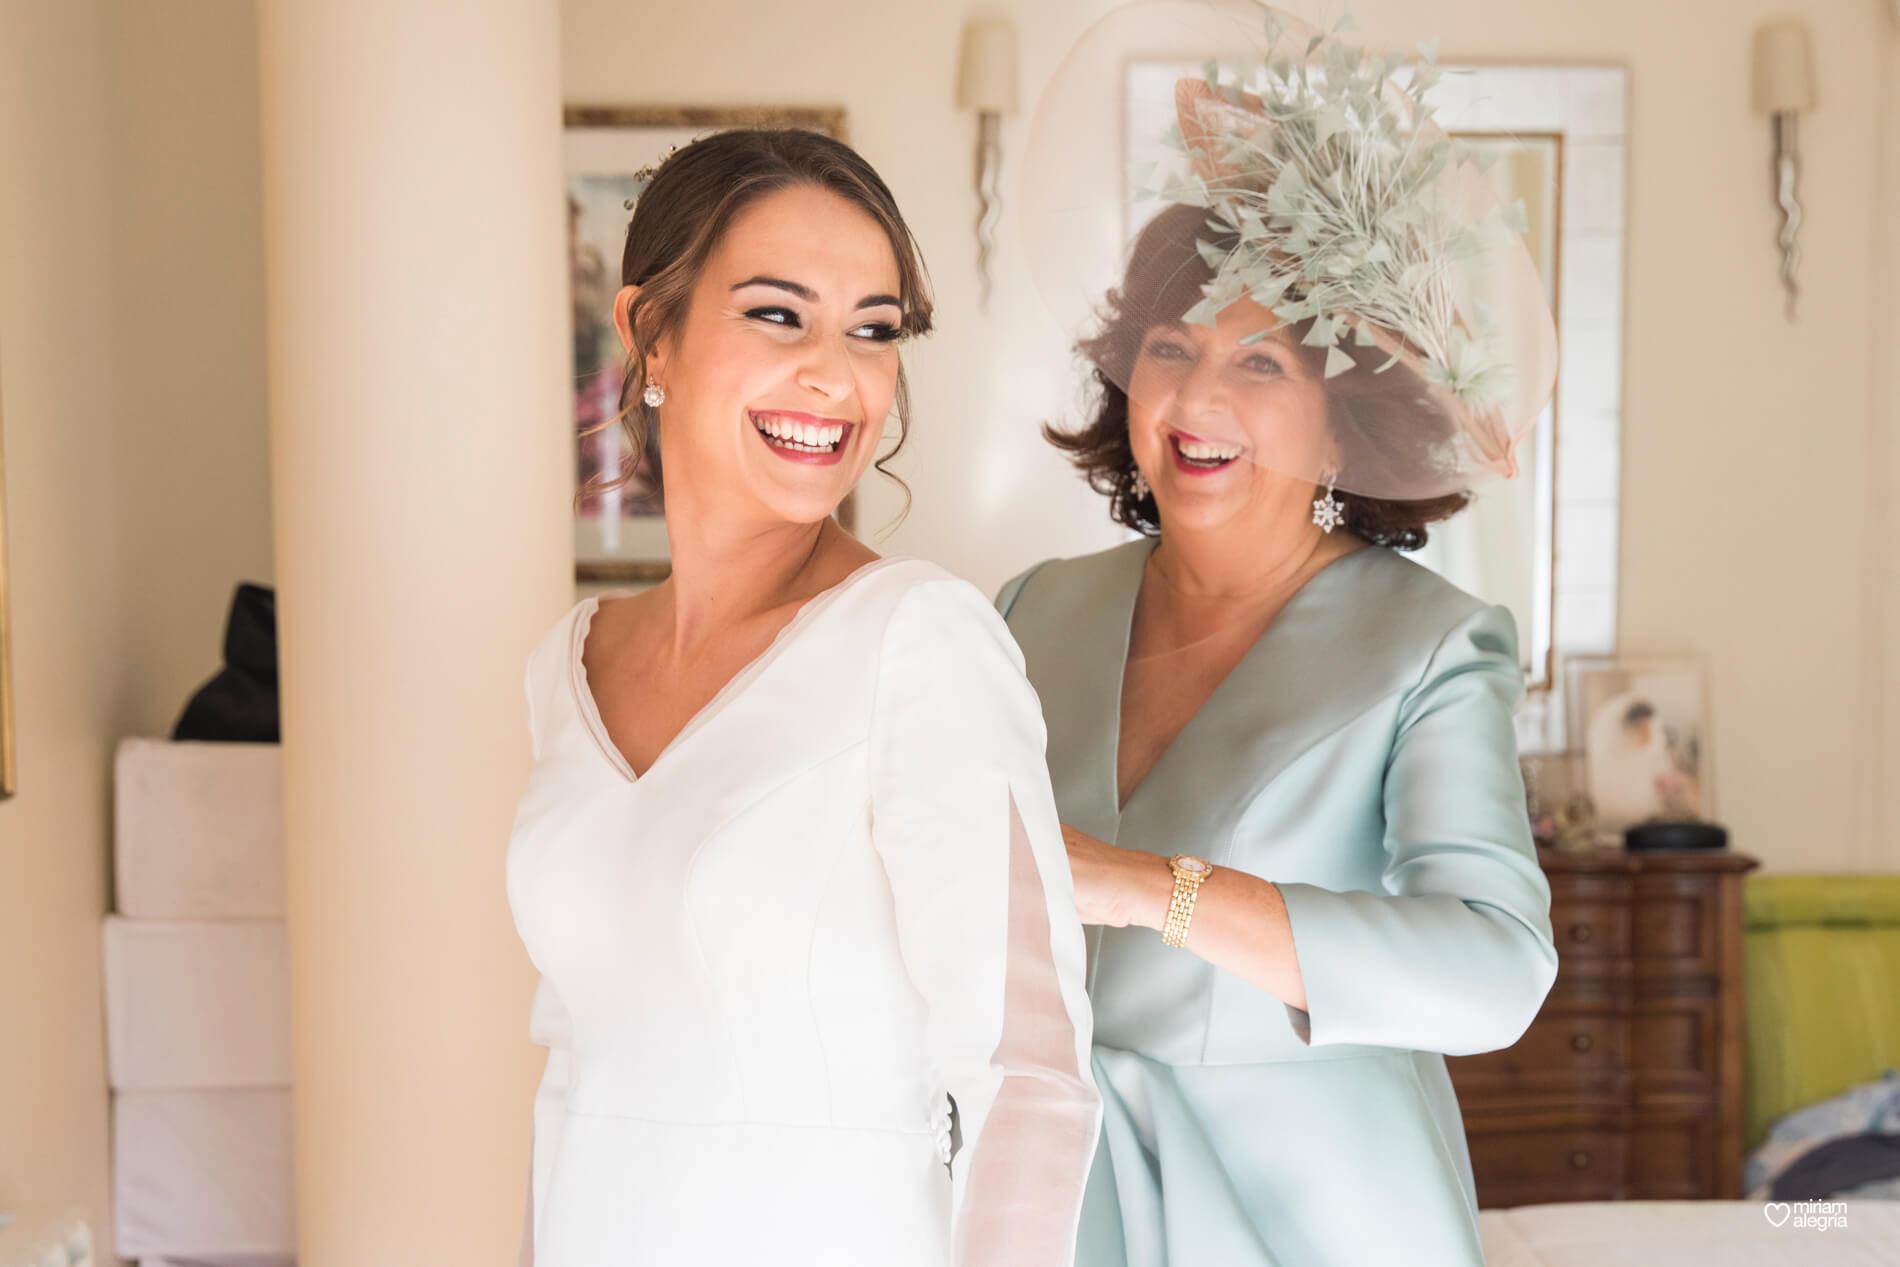 vestido-de-novia-paula-del-vas-miriam-alegria-fotografos-boda-murcia-22